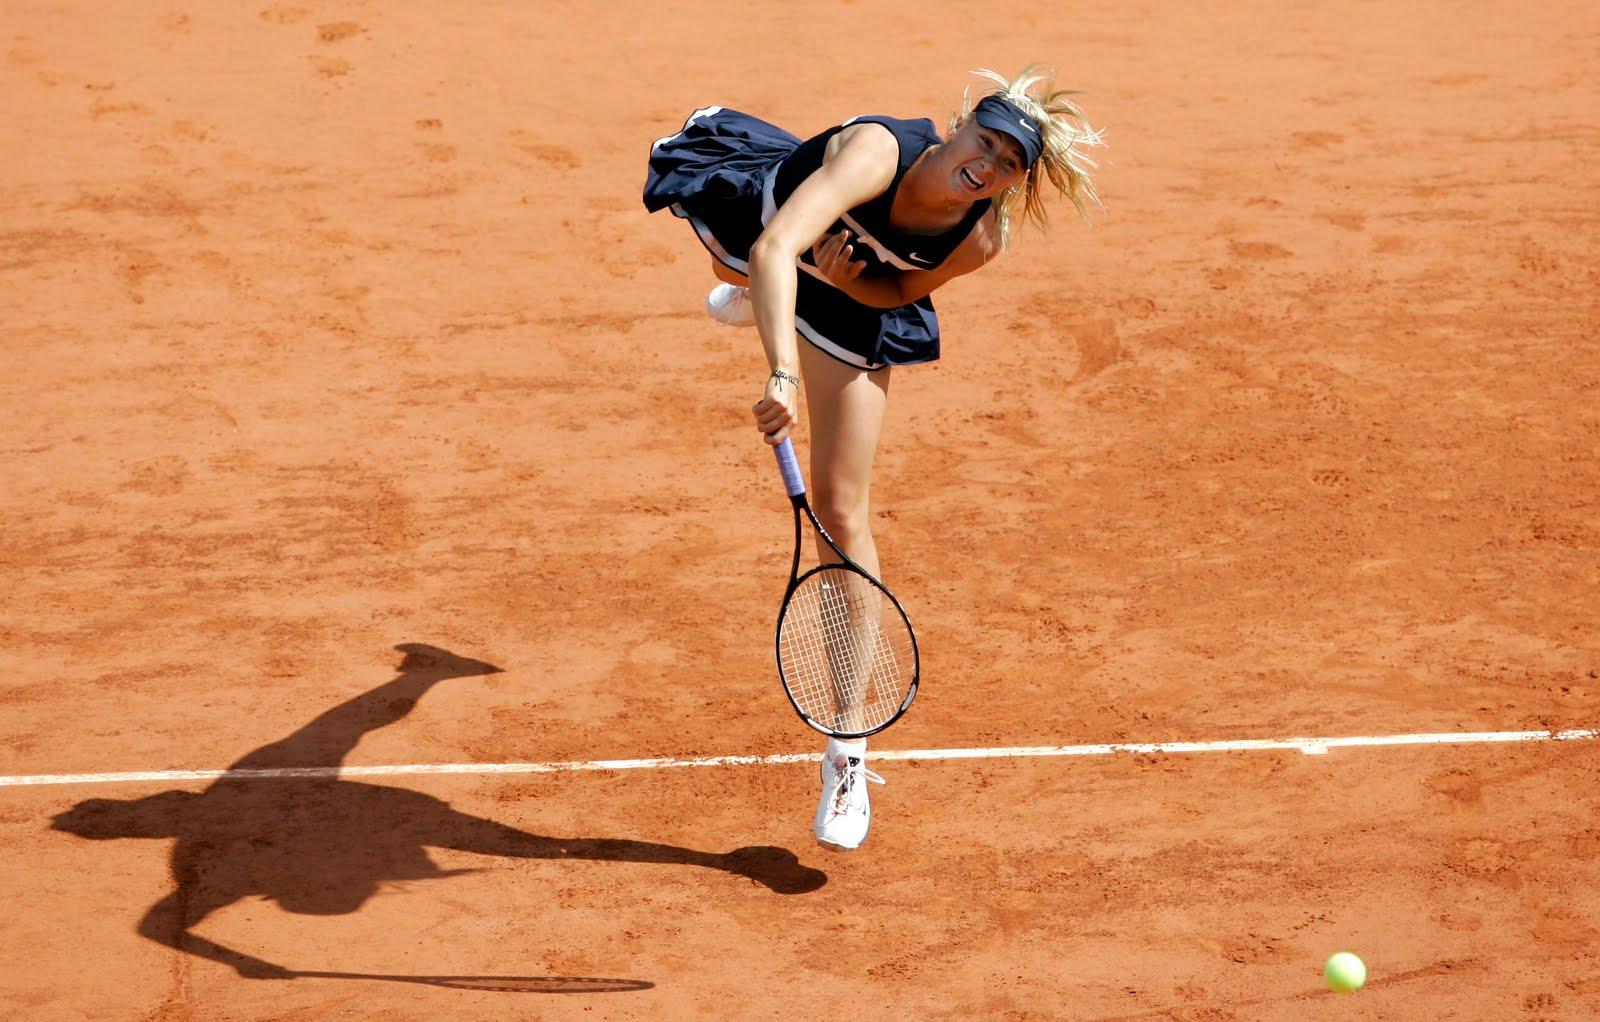 http://3.bp.blogspot.com/-GuXasuFNjaQ/TbXSJg0R4wI/AAAAAAAADTM/RCyQqFAiB-c/s1600/73193_Celebutopia-Maria_Sharapova-2008_French_Open_Roland_Garros_Day_4-04_122_463lo.jpg